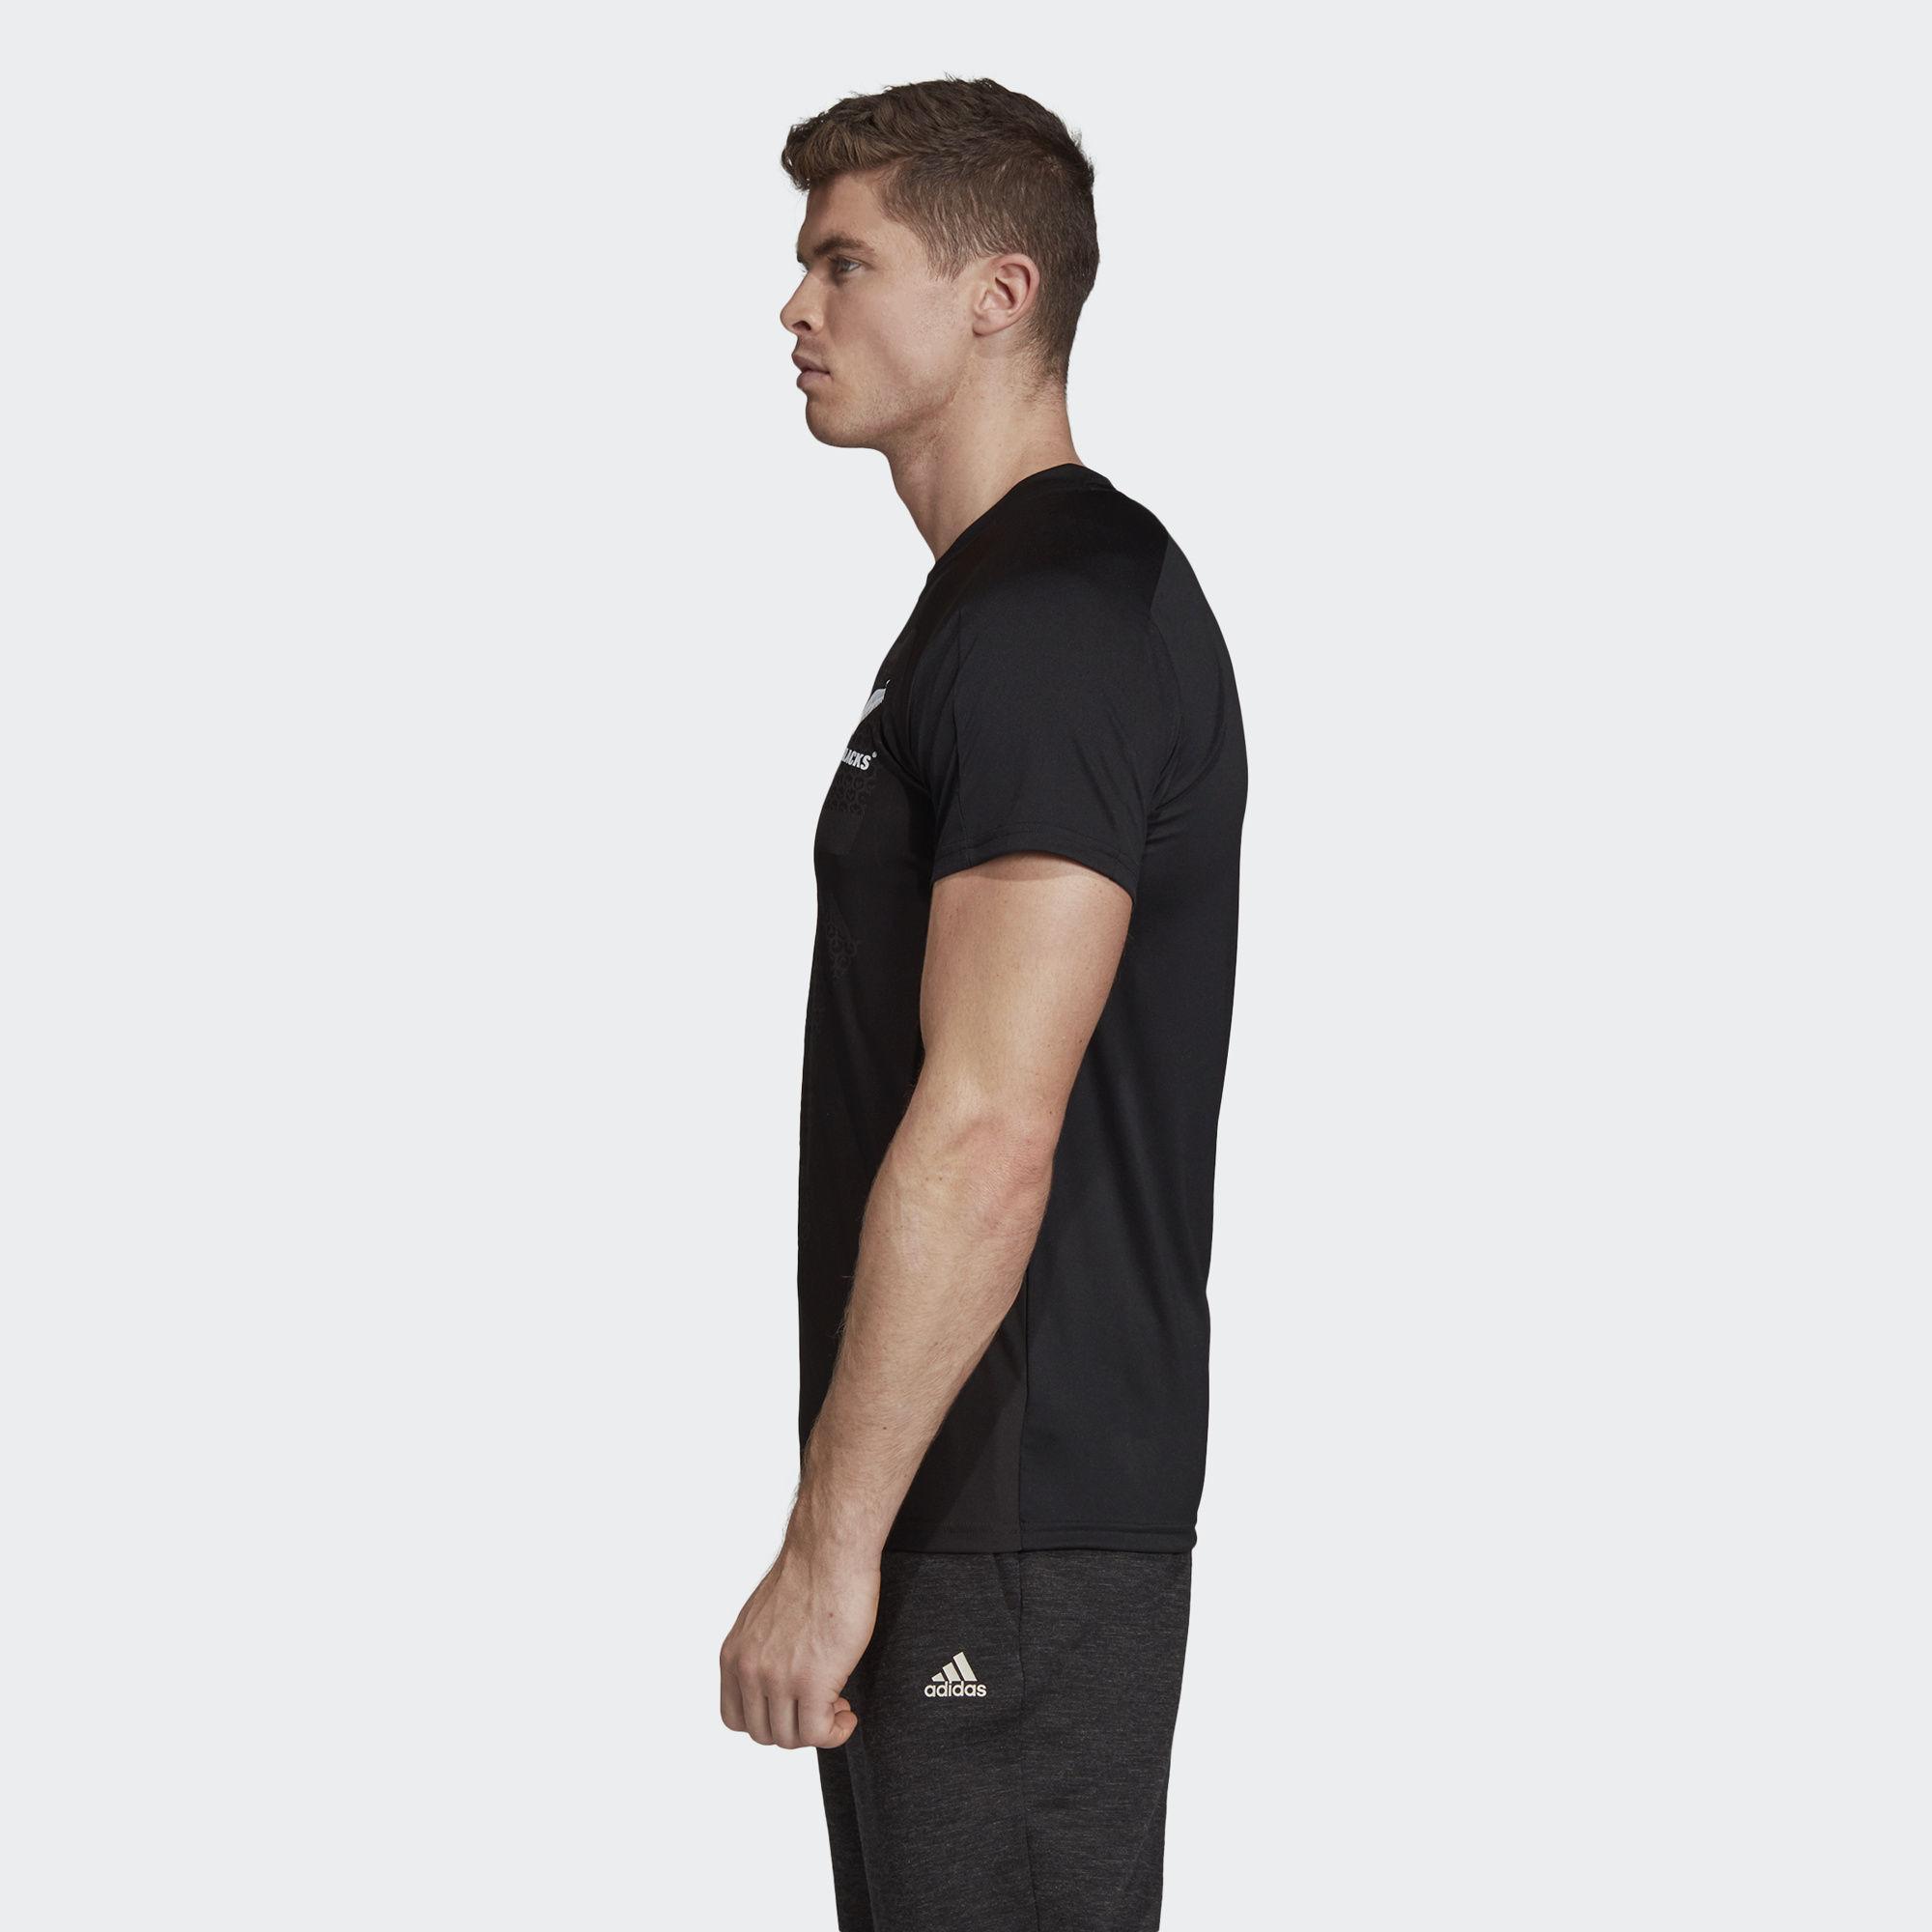 512b04ed3841df Adidas - All Blacks Home Performance Tee for Men - Lyst. View fullscreen